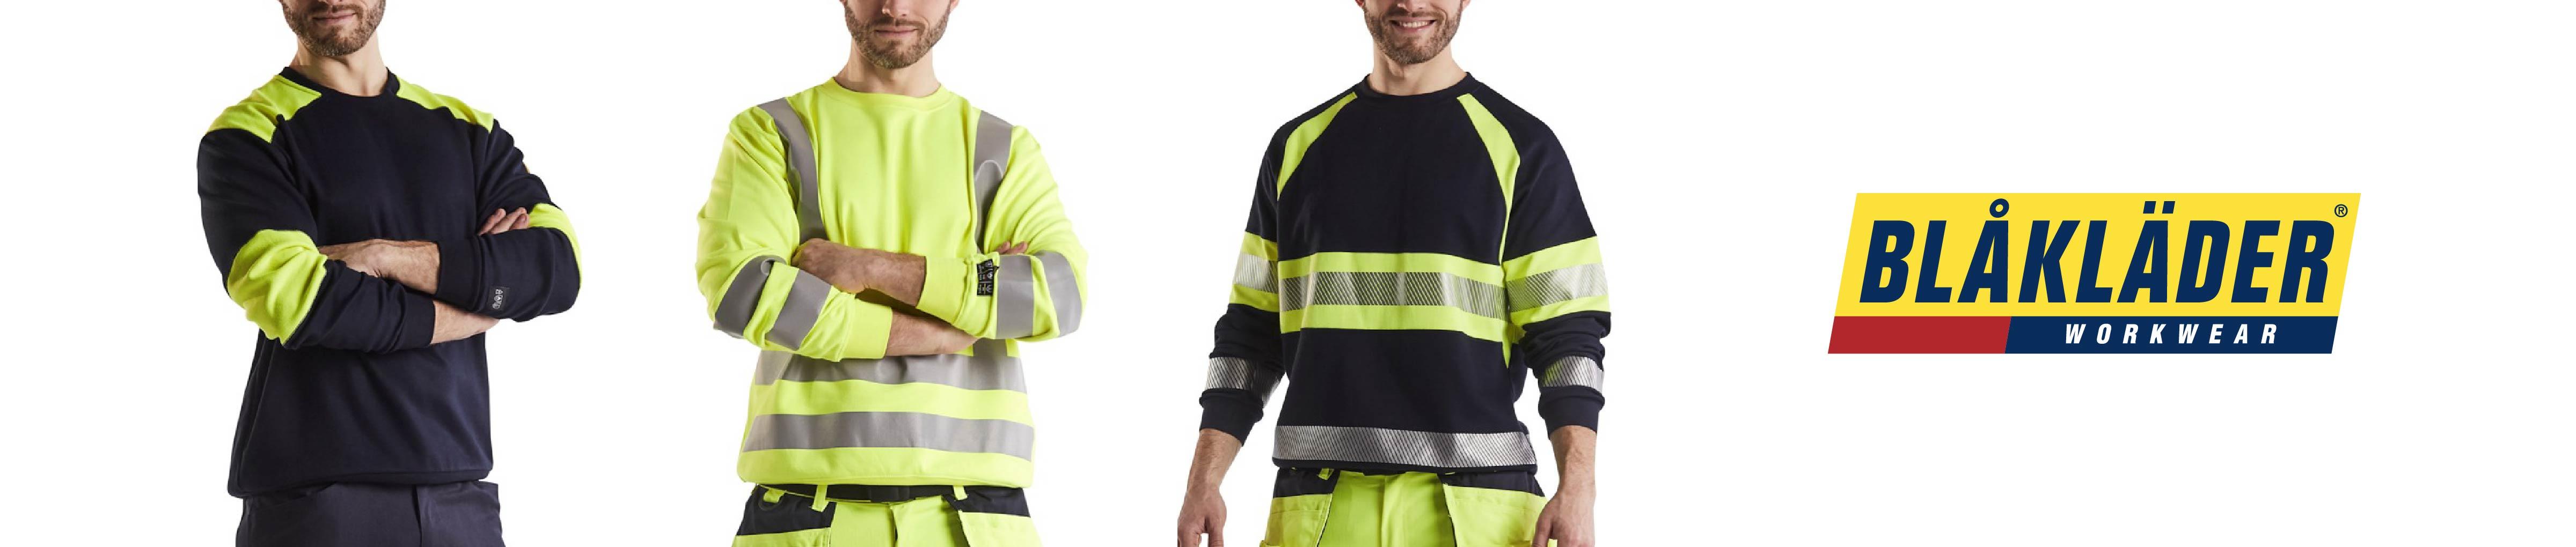 Flame retardant work sweaters